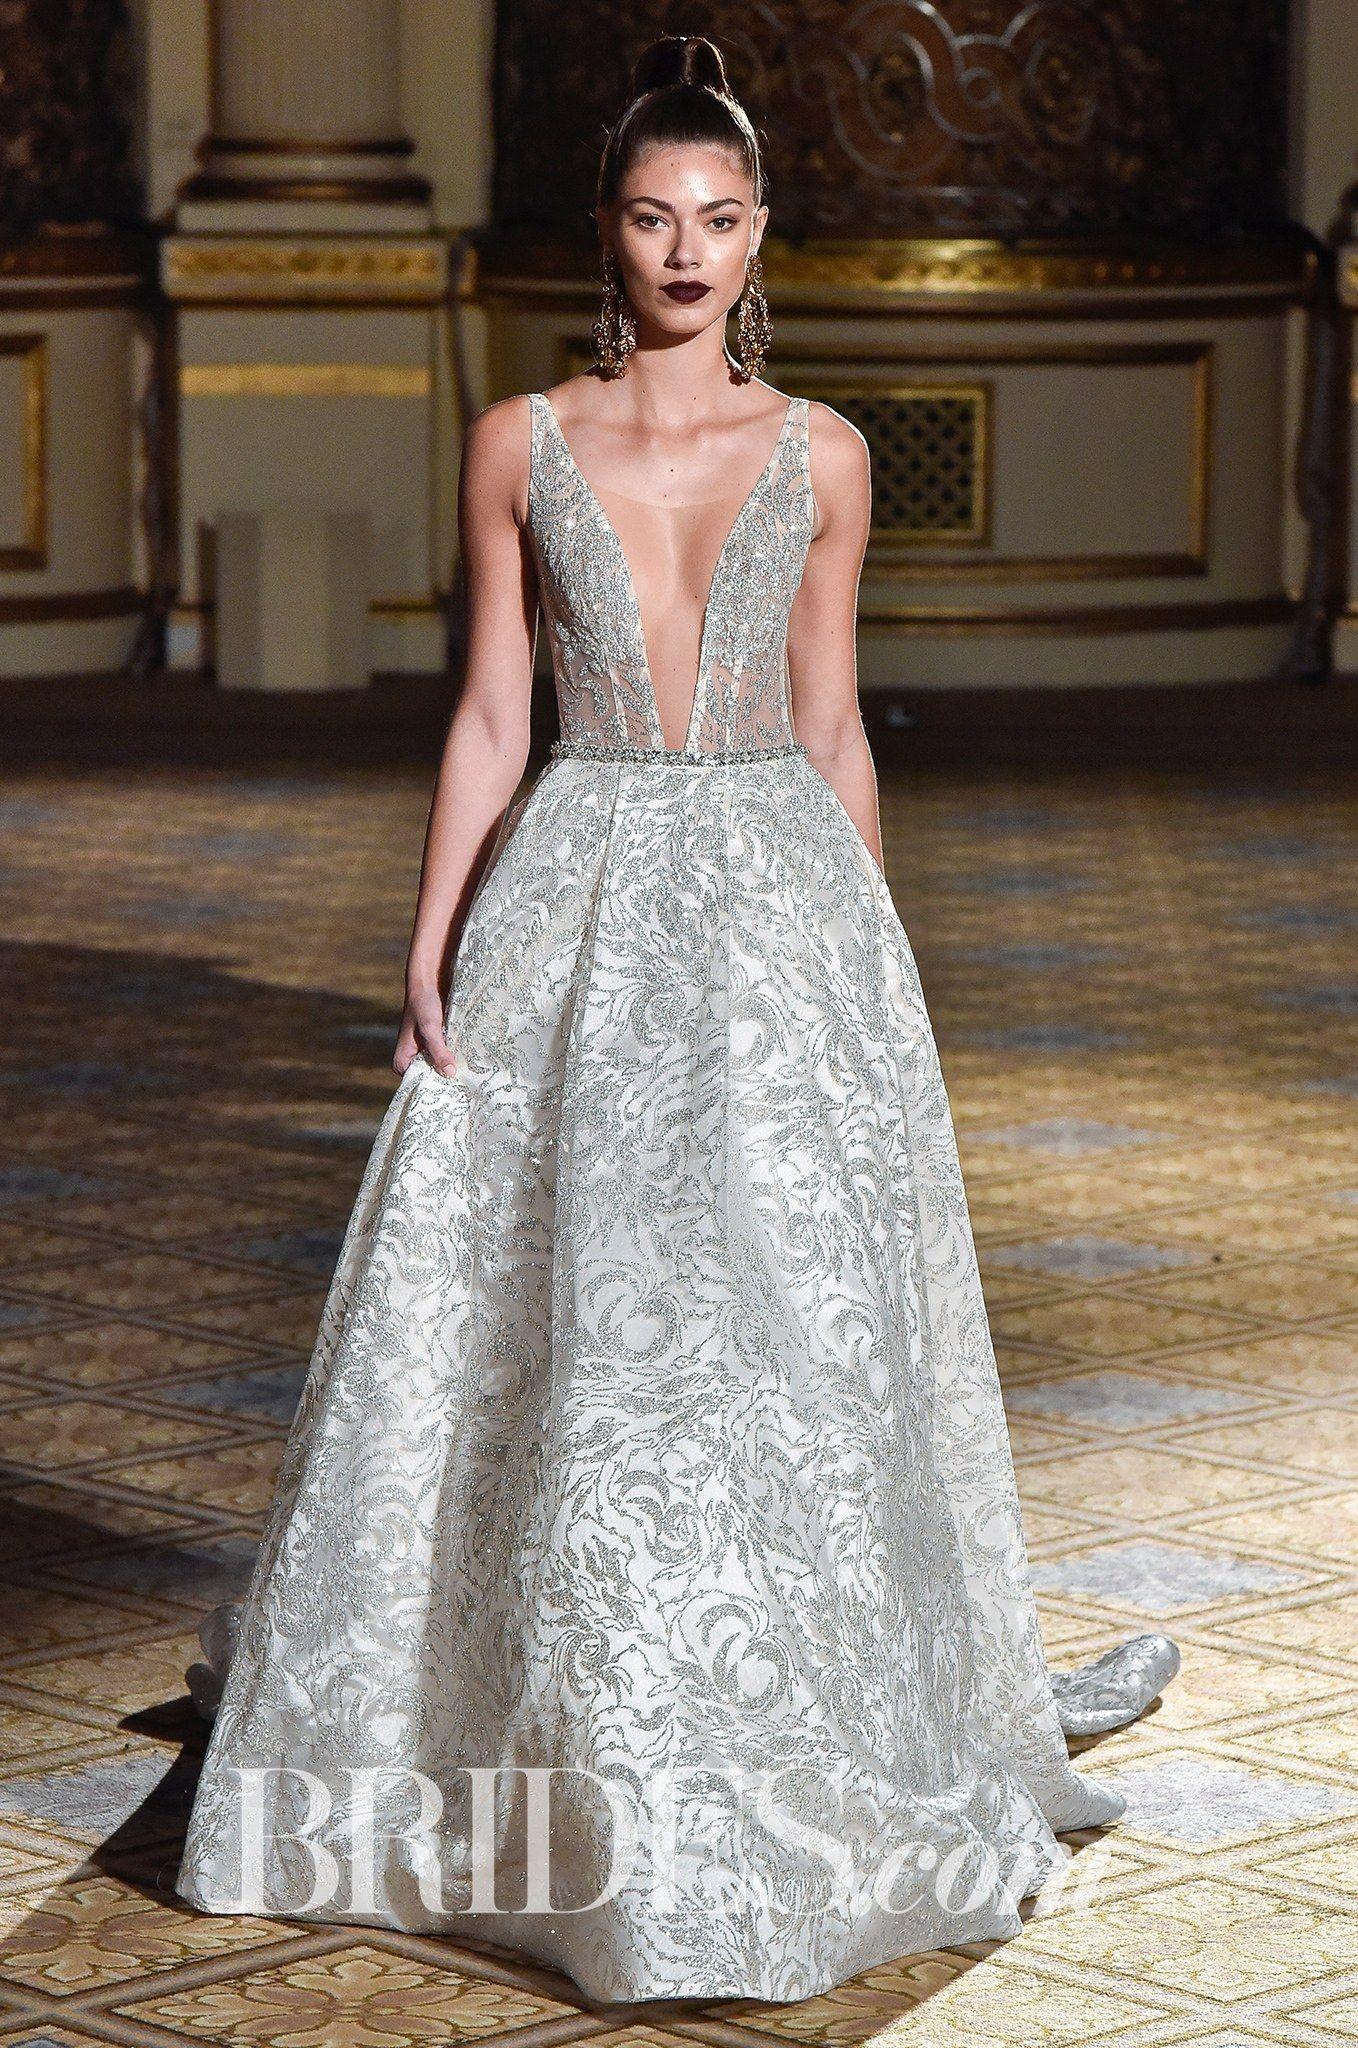 Berta Bridal & Wedding Dress Collection Spring 2018   Brides   BERTA ...